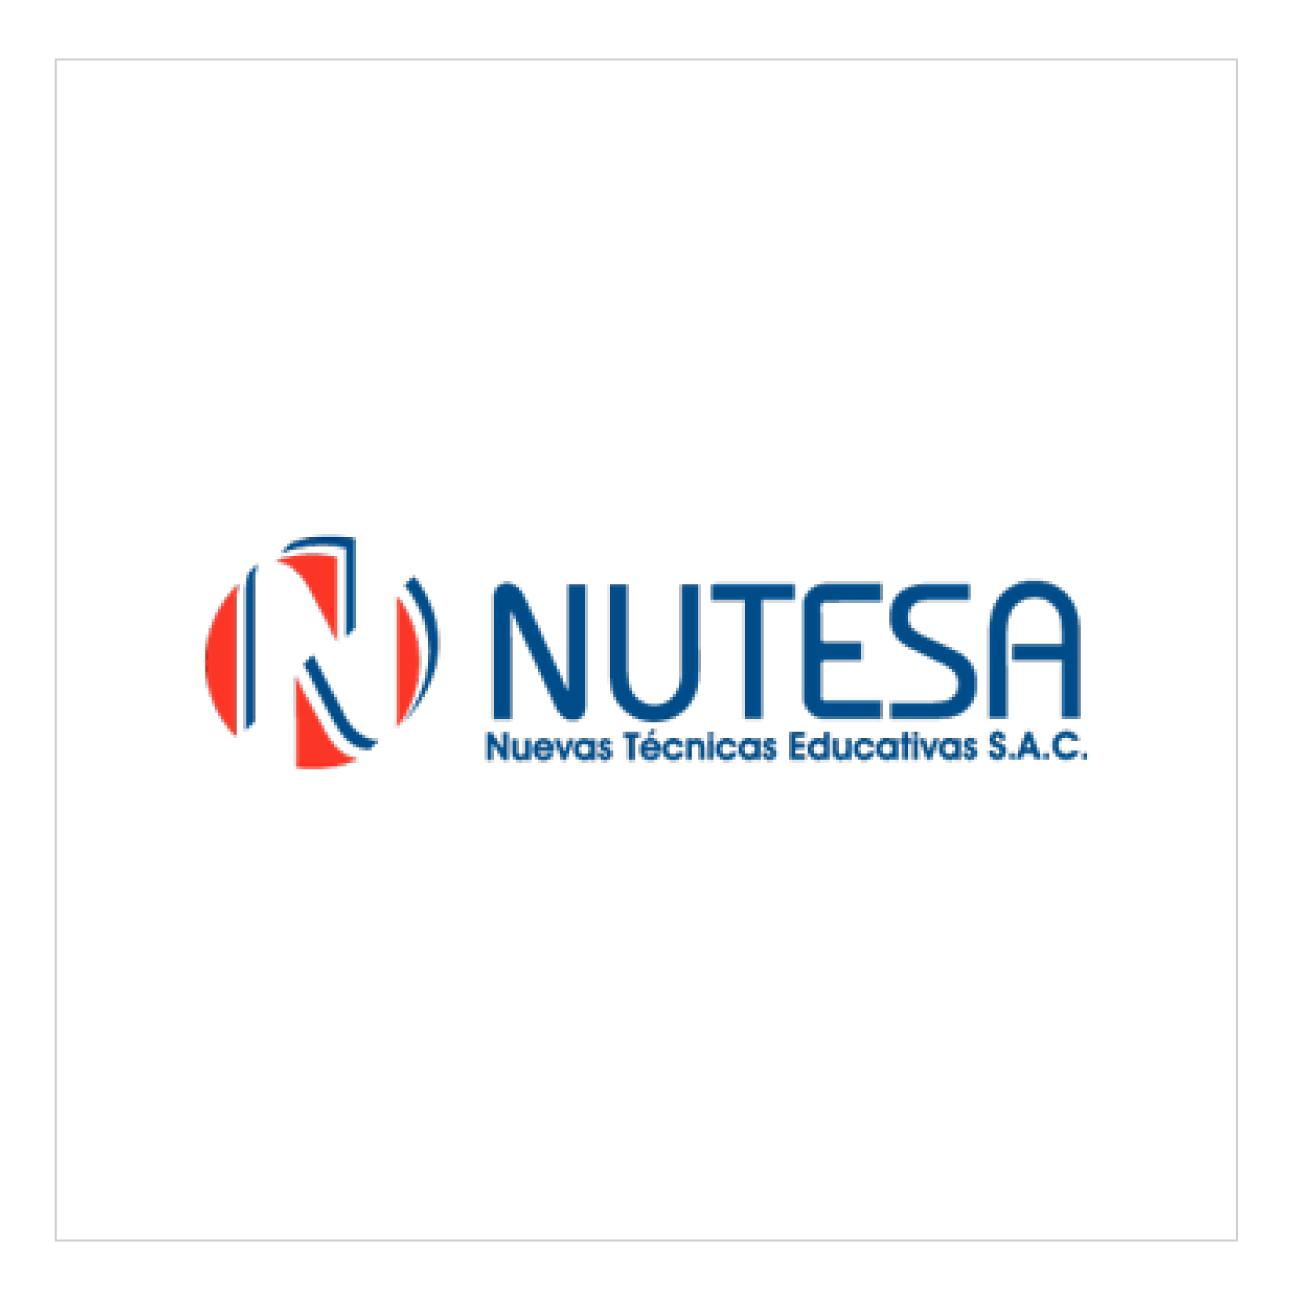 Nutesa.png